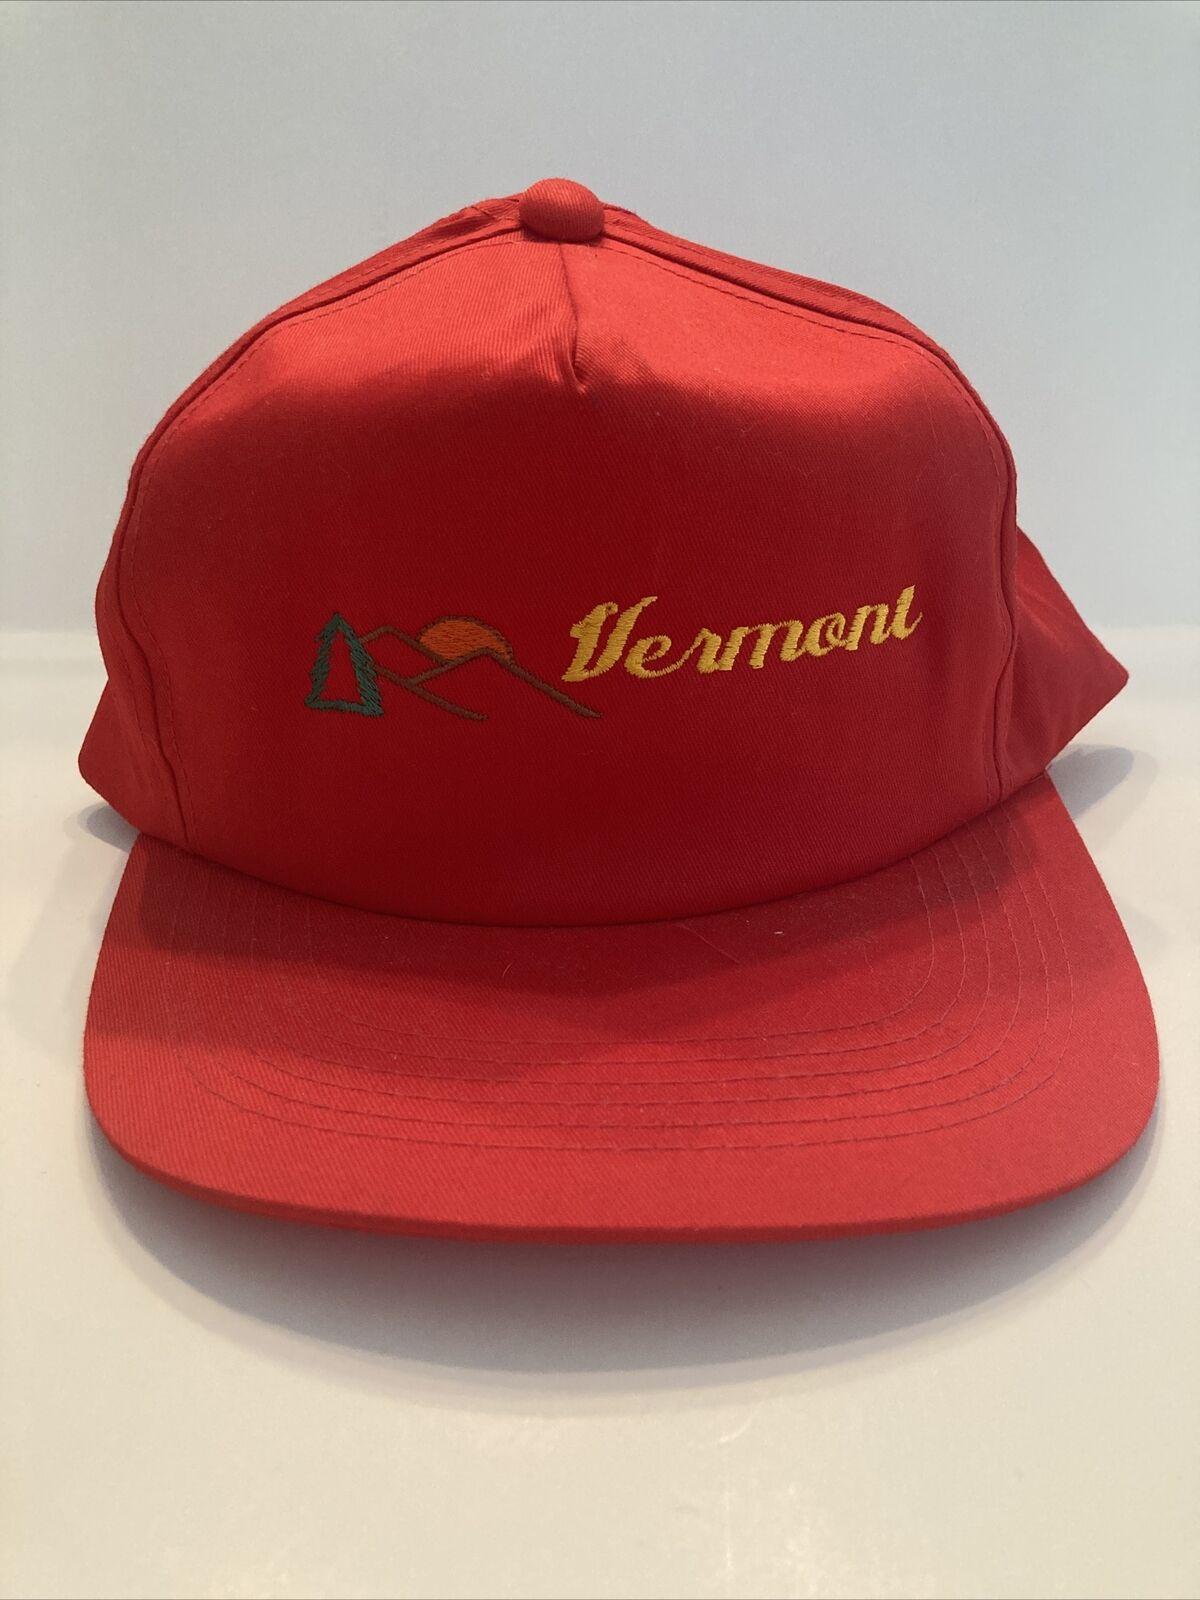 Vintage Red Vermont Snap Back Hat, J Hats, Embroi… - image 2